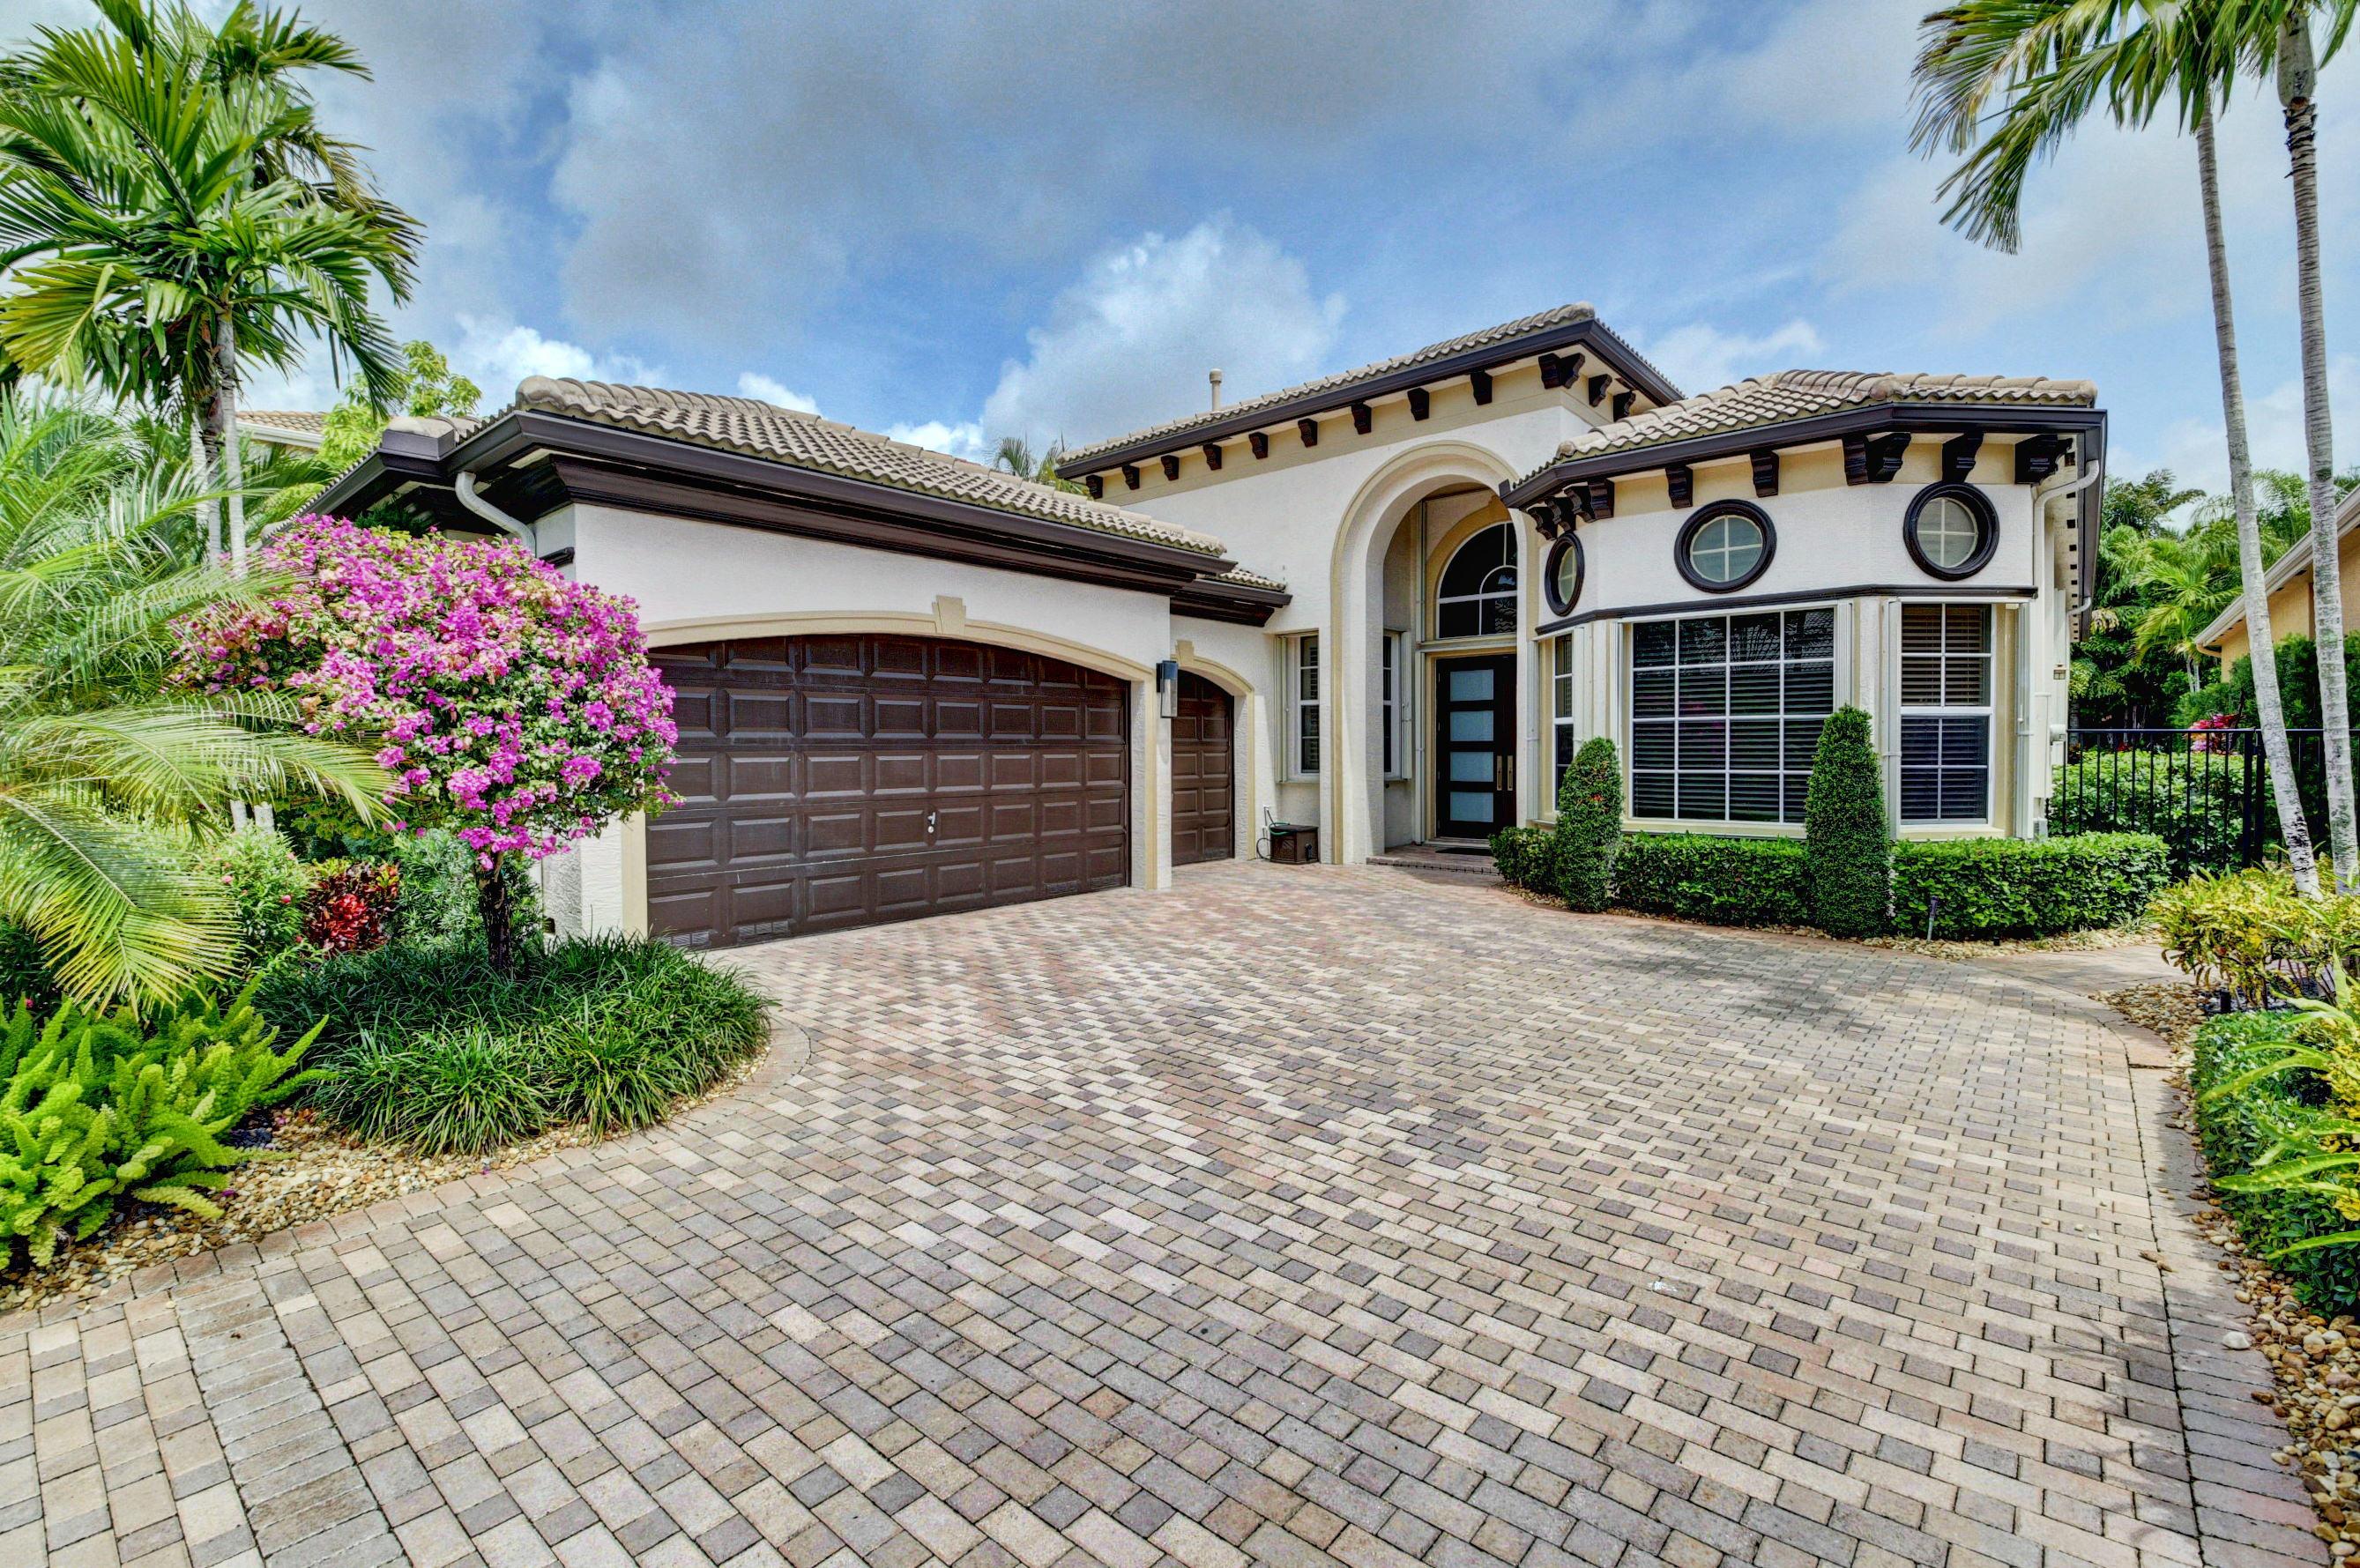 6211 Via Venetia, Delray Beach, Florida 33484, 3 Bedrooms Bedrooms, ,3 BathroomsBathrooms,Single Family,For Sale,Mizners Preserve,Via Venetia,1,RX-10527601